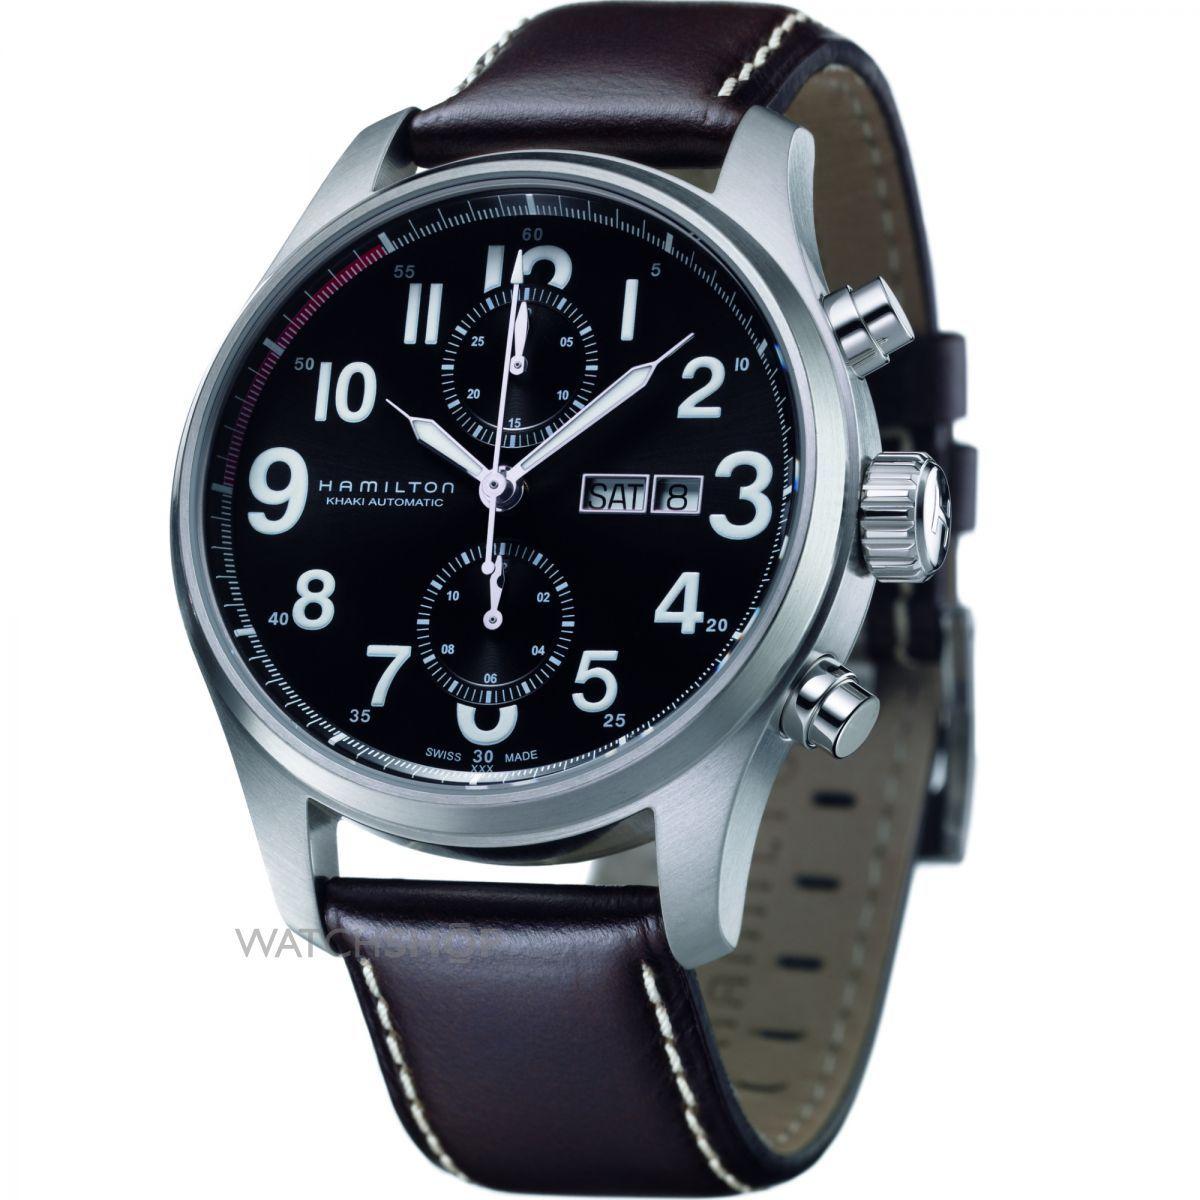 d641ea94a hamilton watches   Hamilton Khaki Officer Automatic Chronograph Watch  (H71716533) - WATCH .